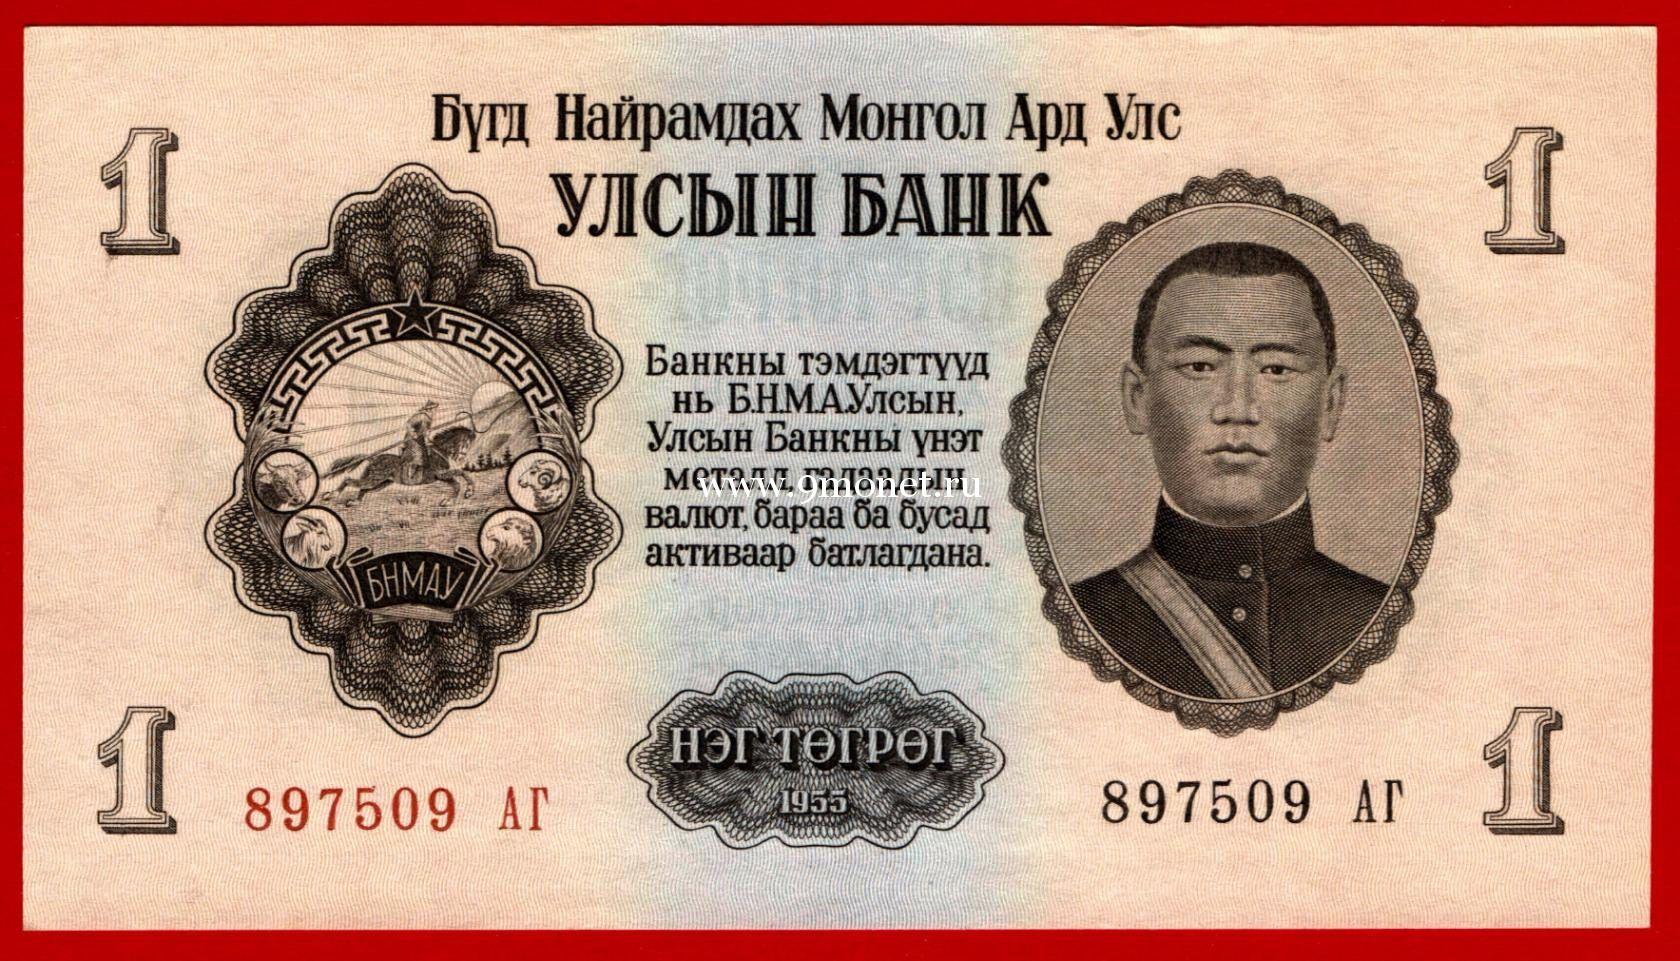 1955 год. Монголия. Банкнота 1 тугрик.